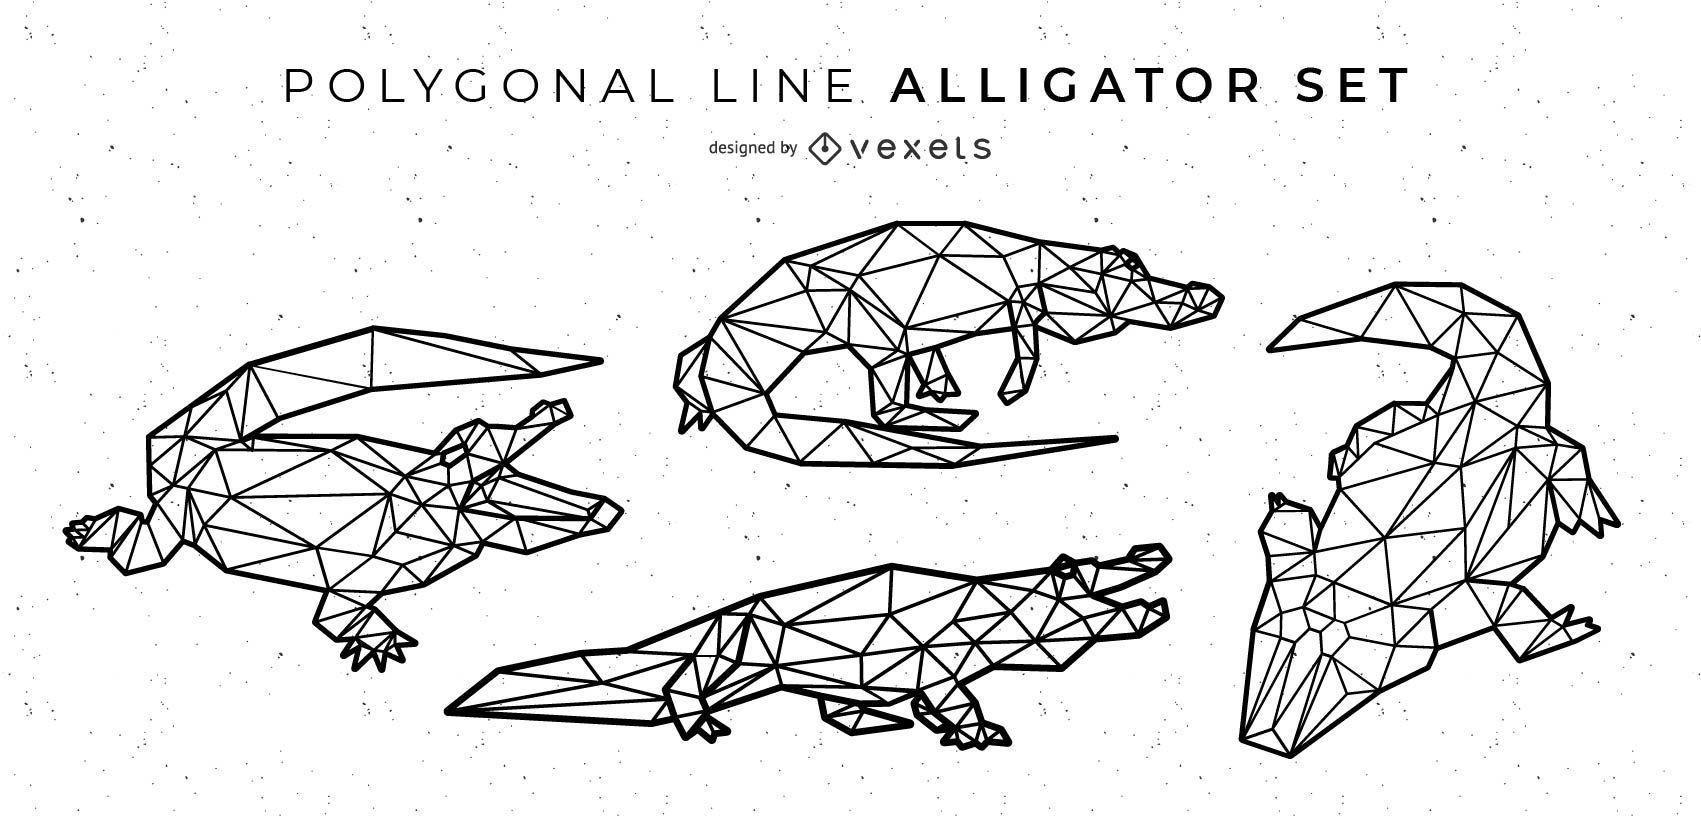 Polygonal Line Alligator Design